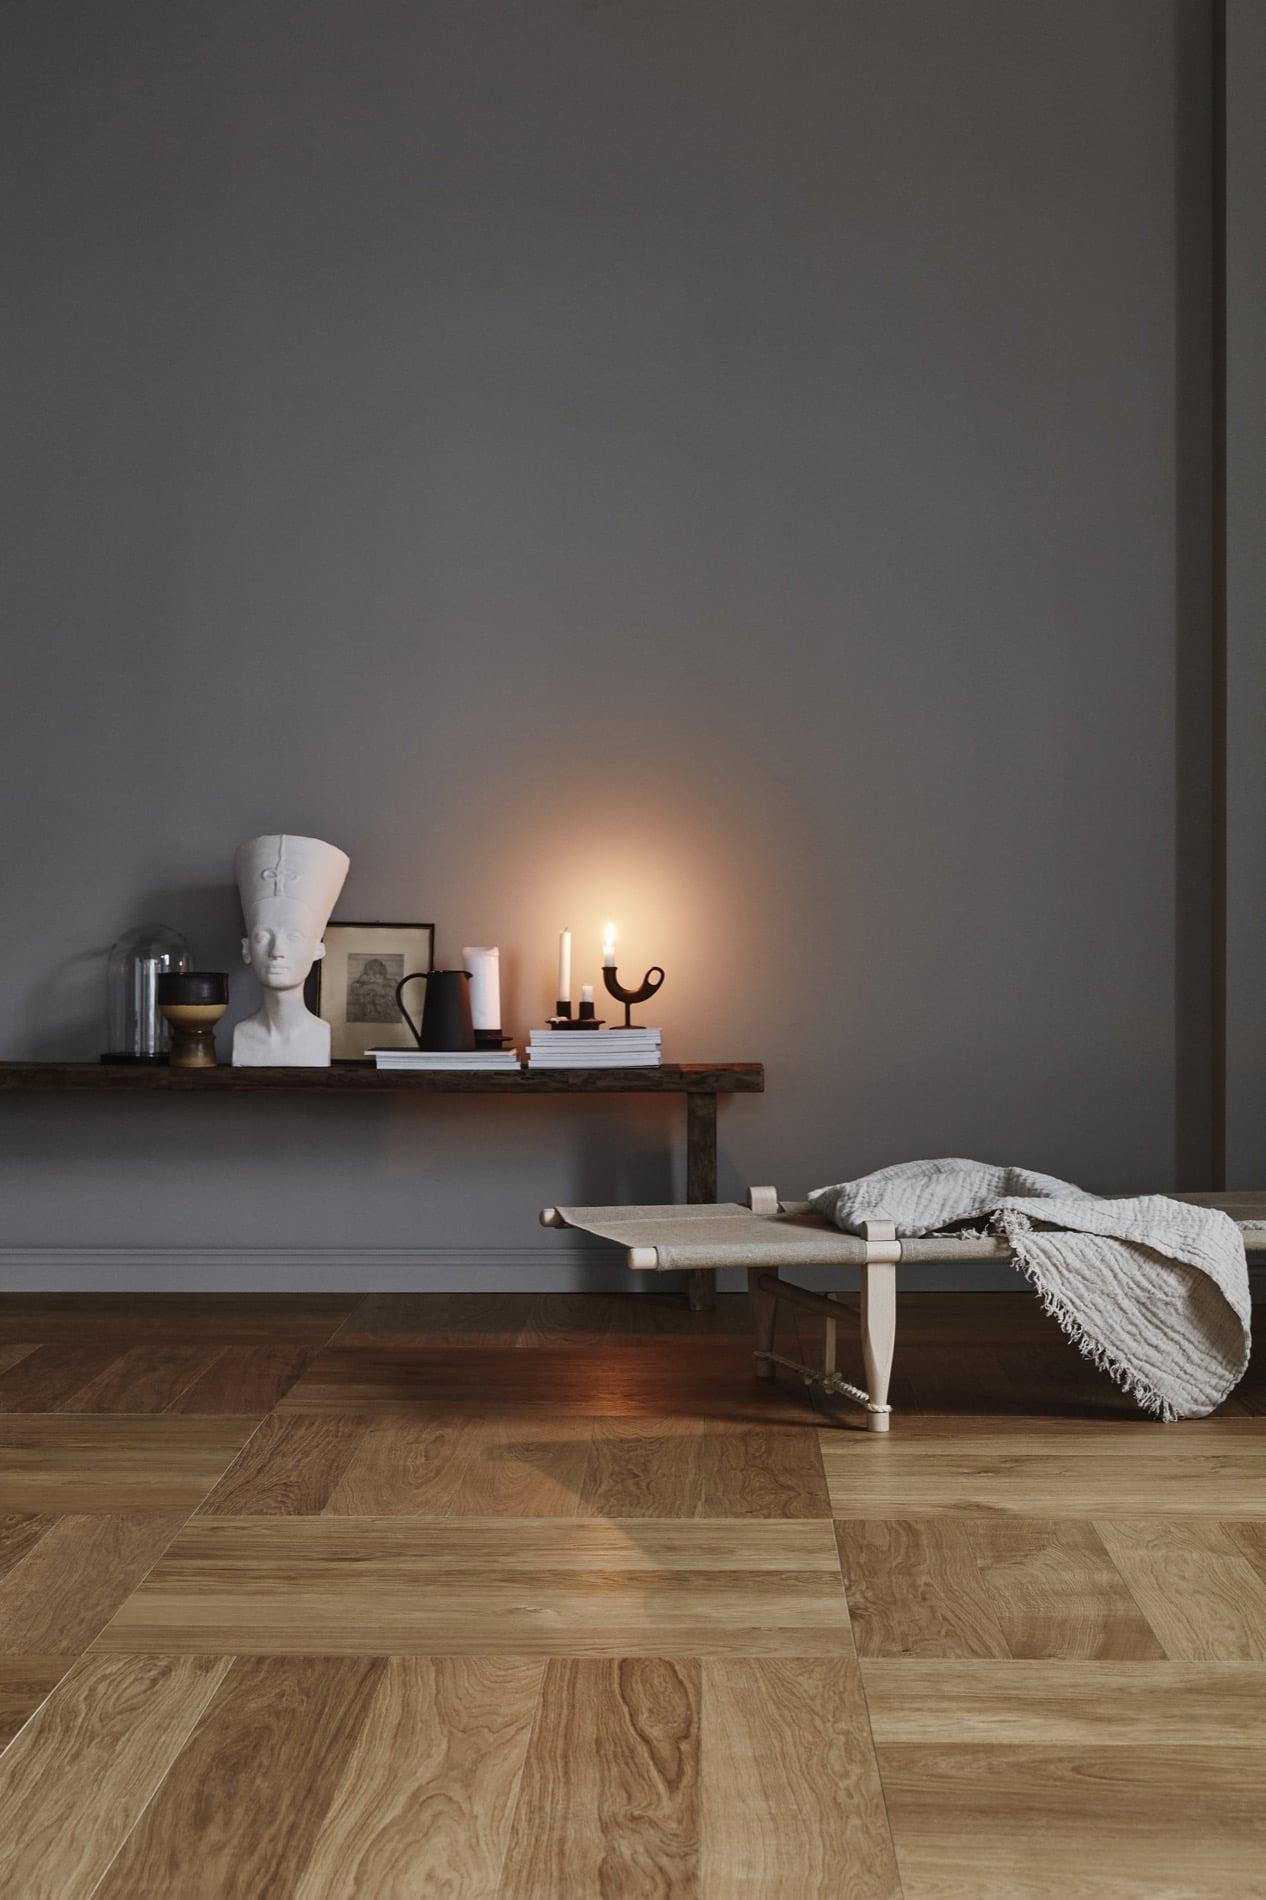 Timberwise parketti puulattia wooden floor parquet Tammi Oak Basketweave_pysty